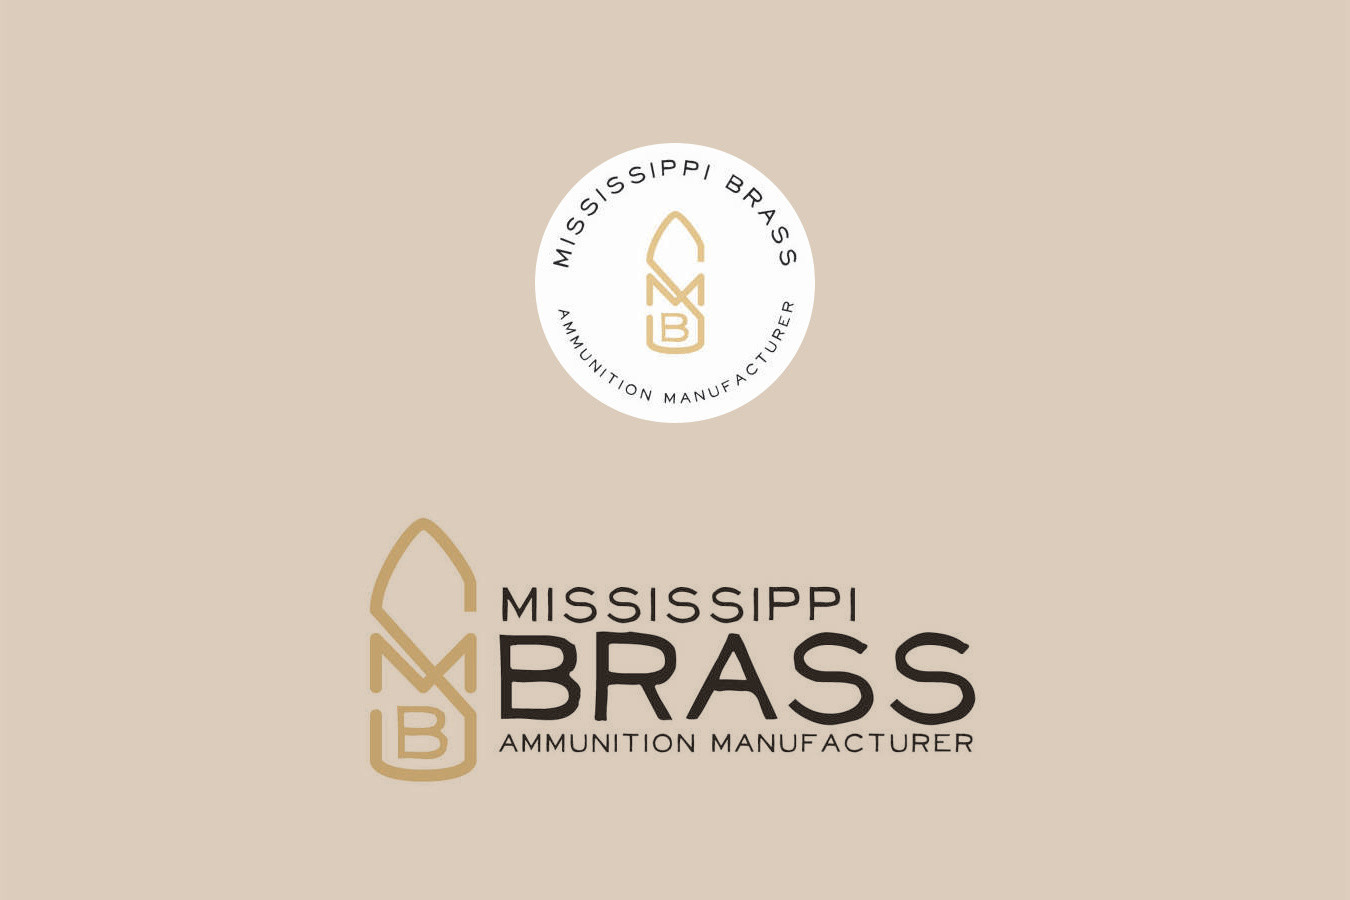 MS Brass Ammunition Logo Design